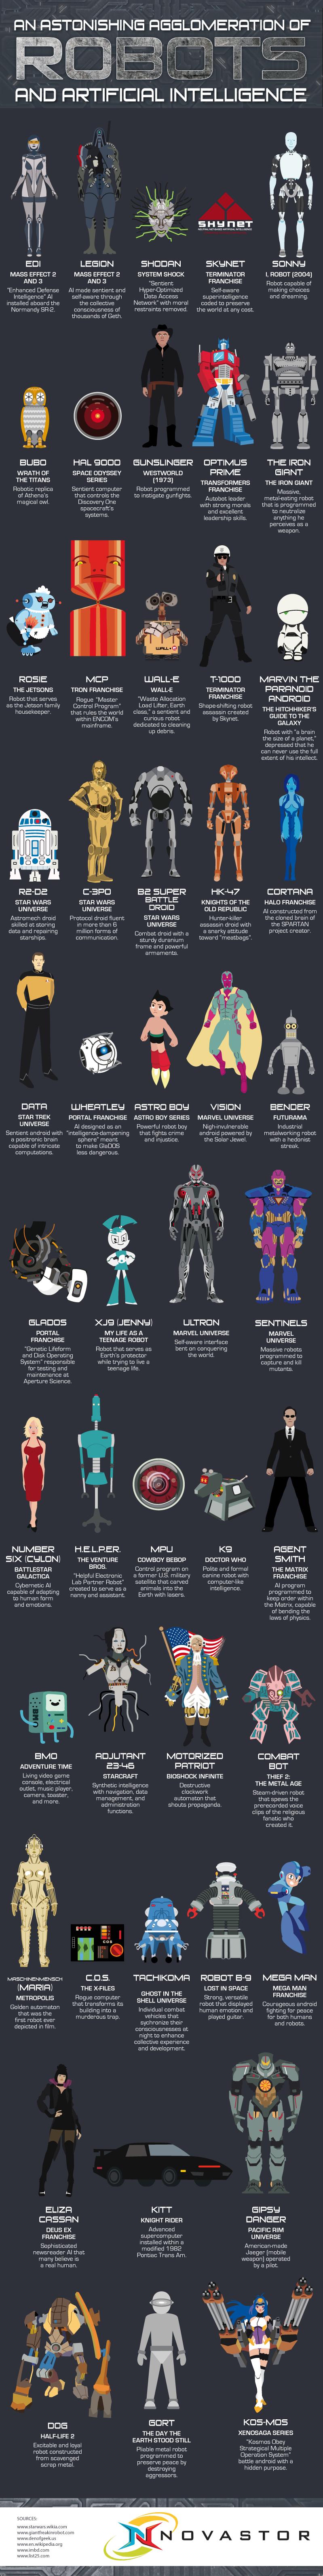 Robots-Agglomeration-Infographic